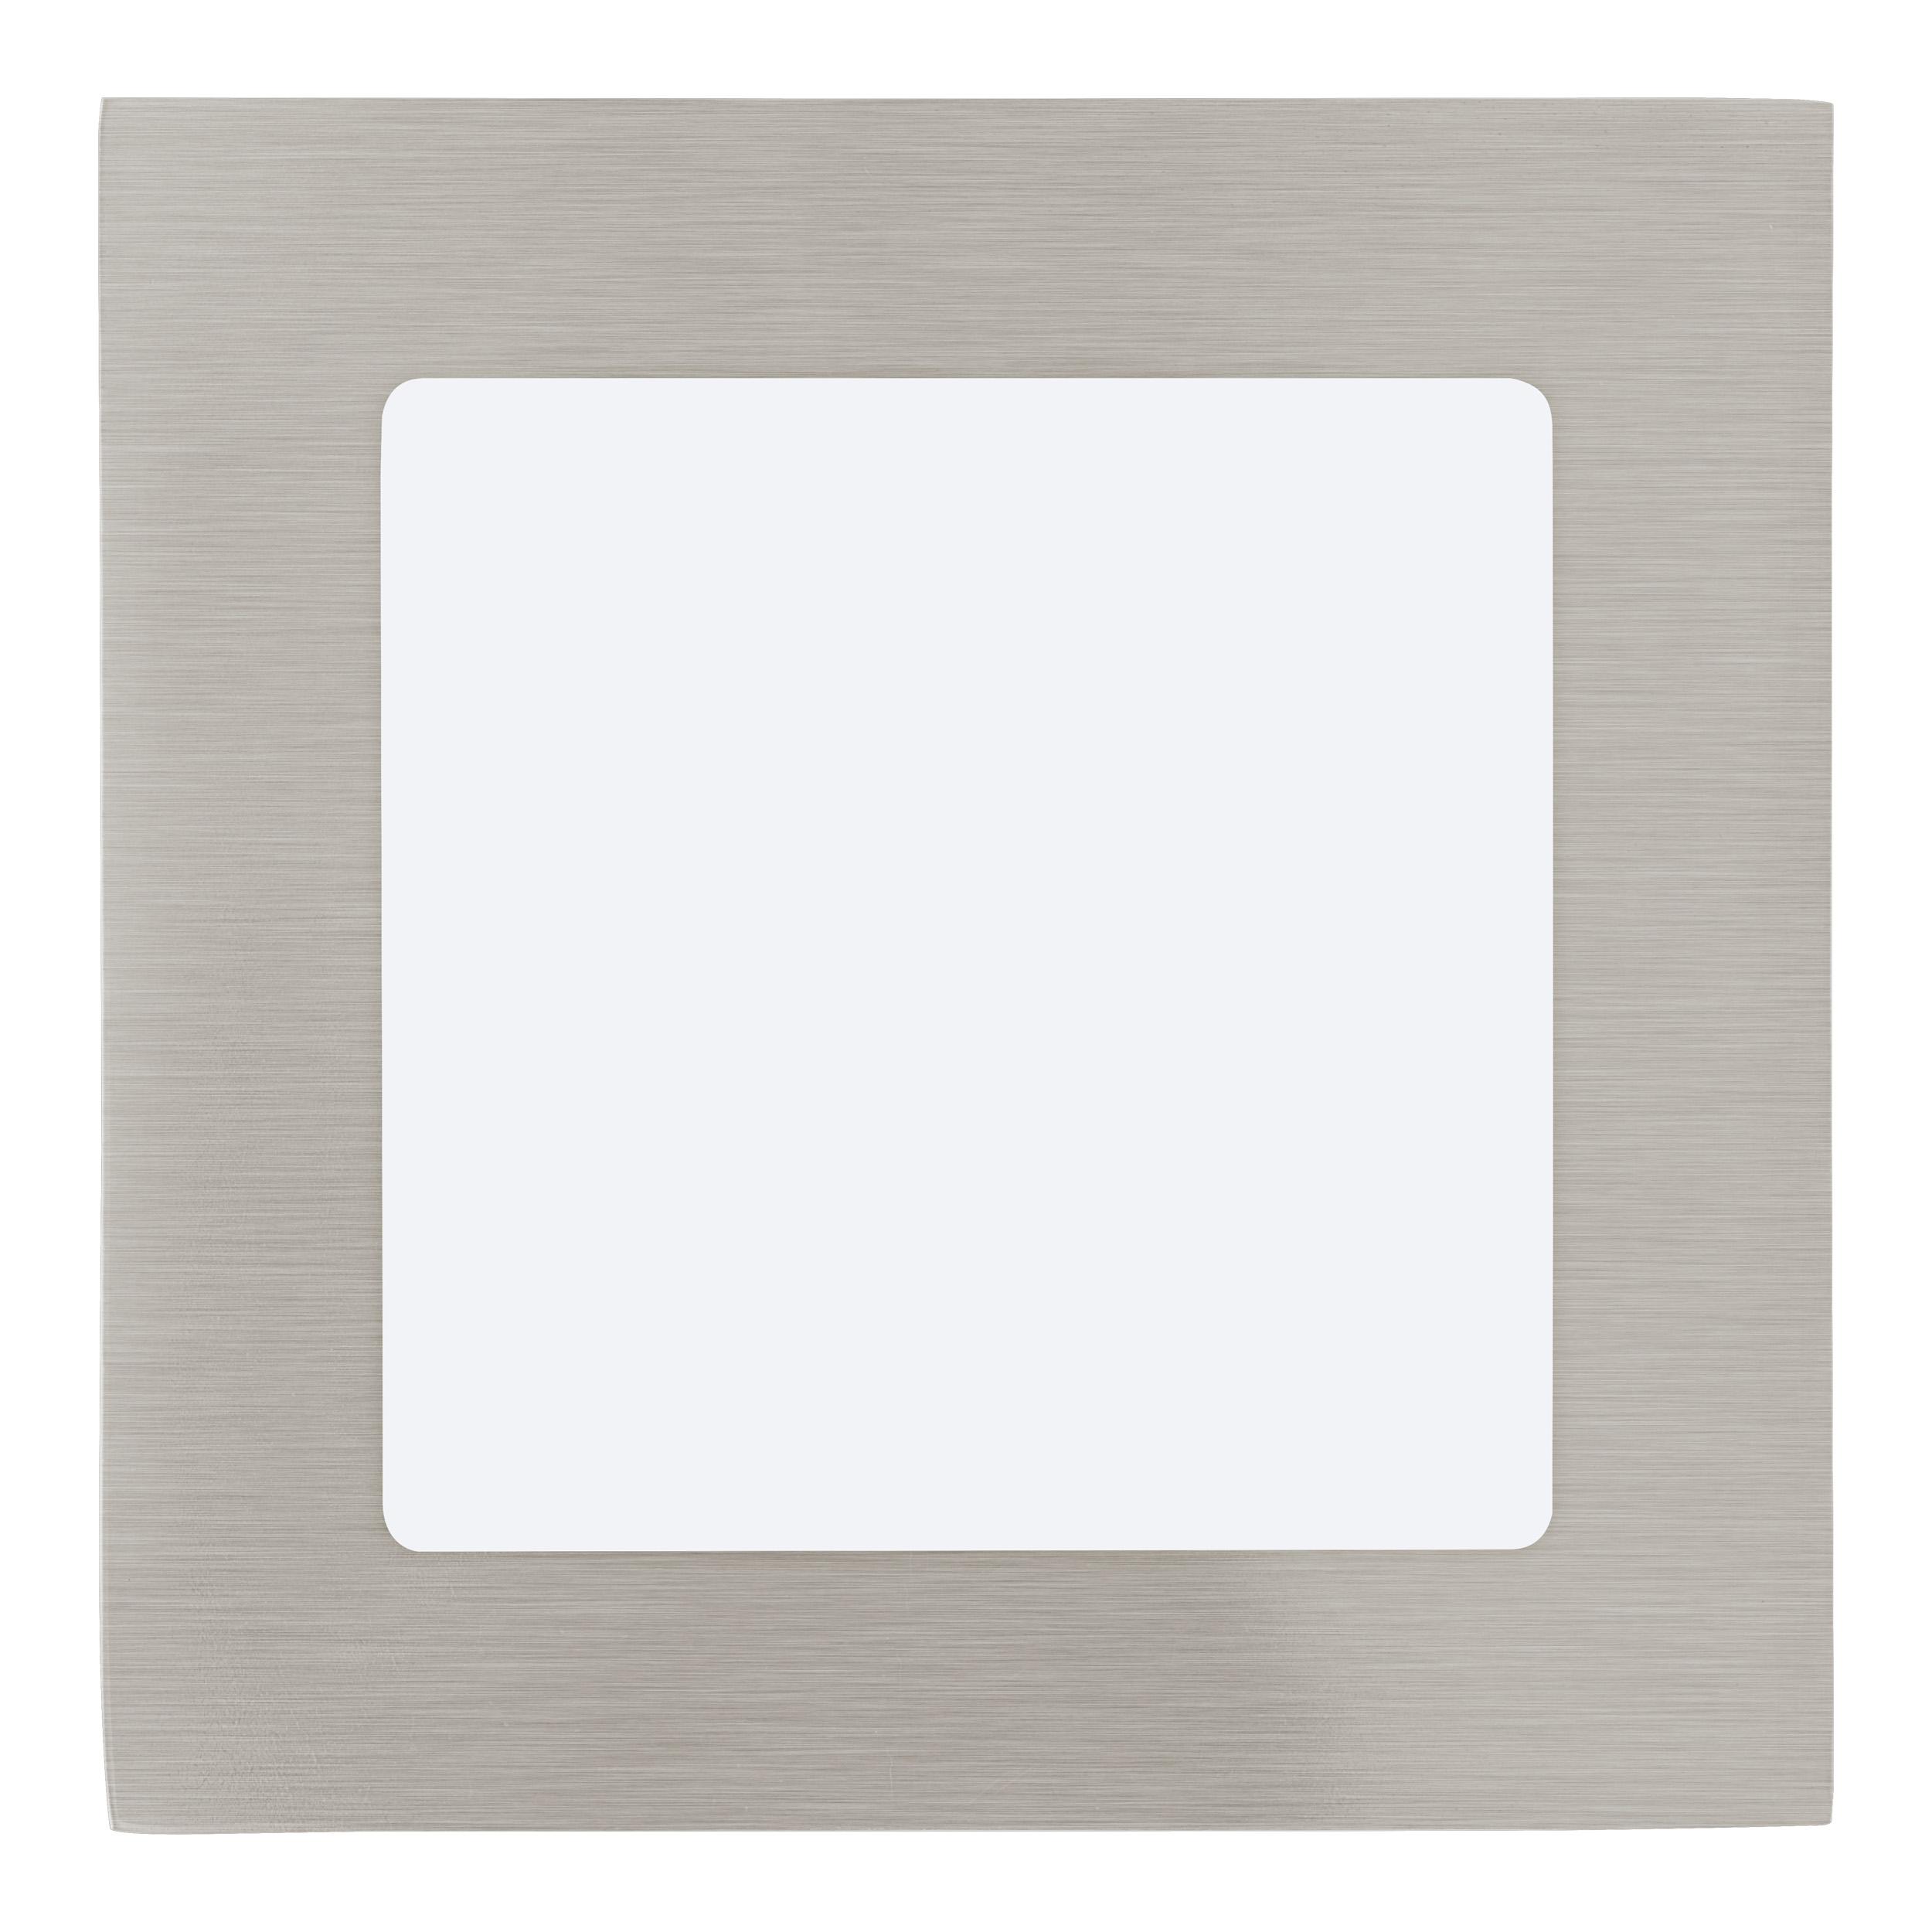 1 Stk Fueva 1 eckig / IP20 5,5W 4000K nickel-matt IP20 LI64611---